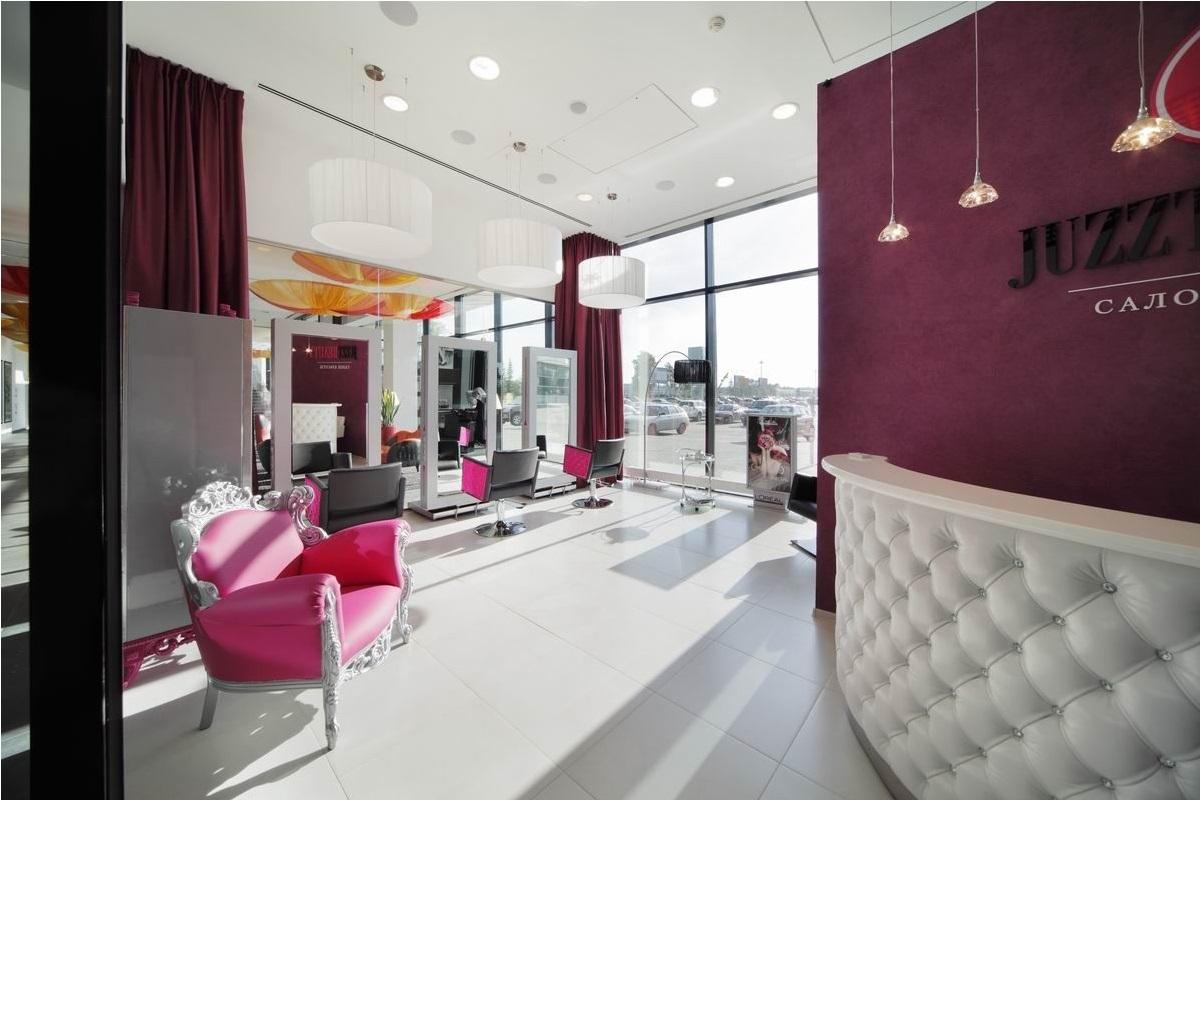 Дизайн салона красоты: фото, стиль, примеры интерьера, имидж | 1032x1200